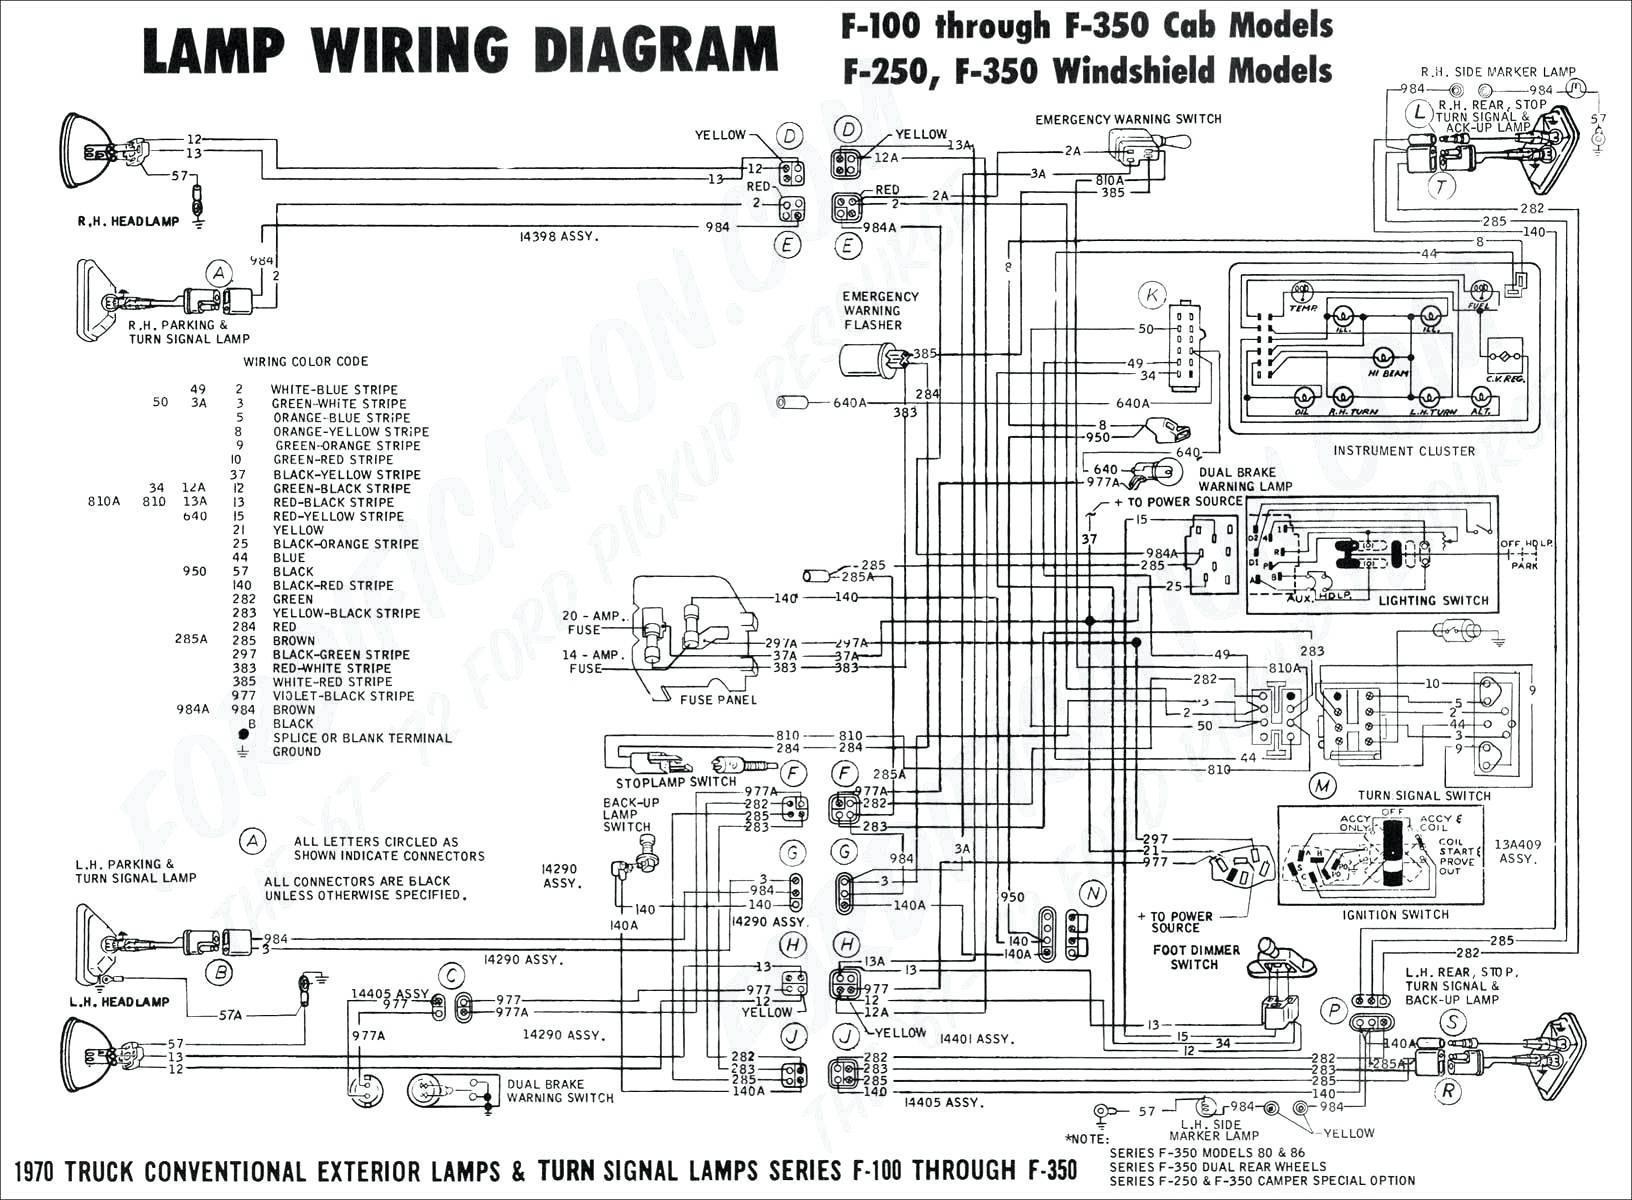 2003 Honda Accord Engine Diagram 2006 Honda Accord Radio Wiring Diagram Shahsramblings Of 2003 Honda Accord Engine Diagram